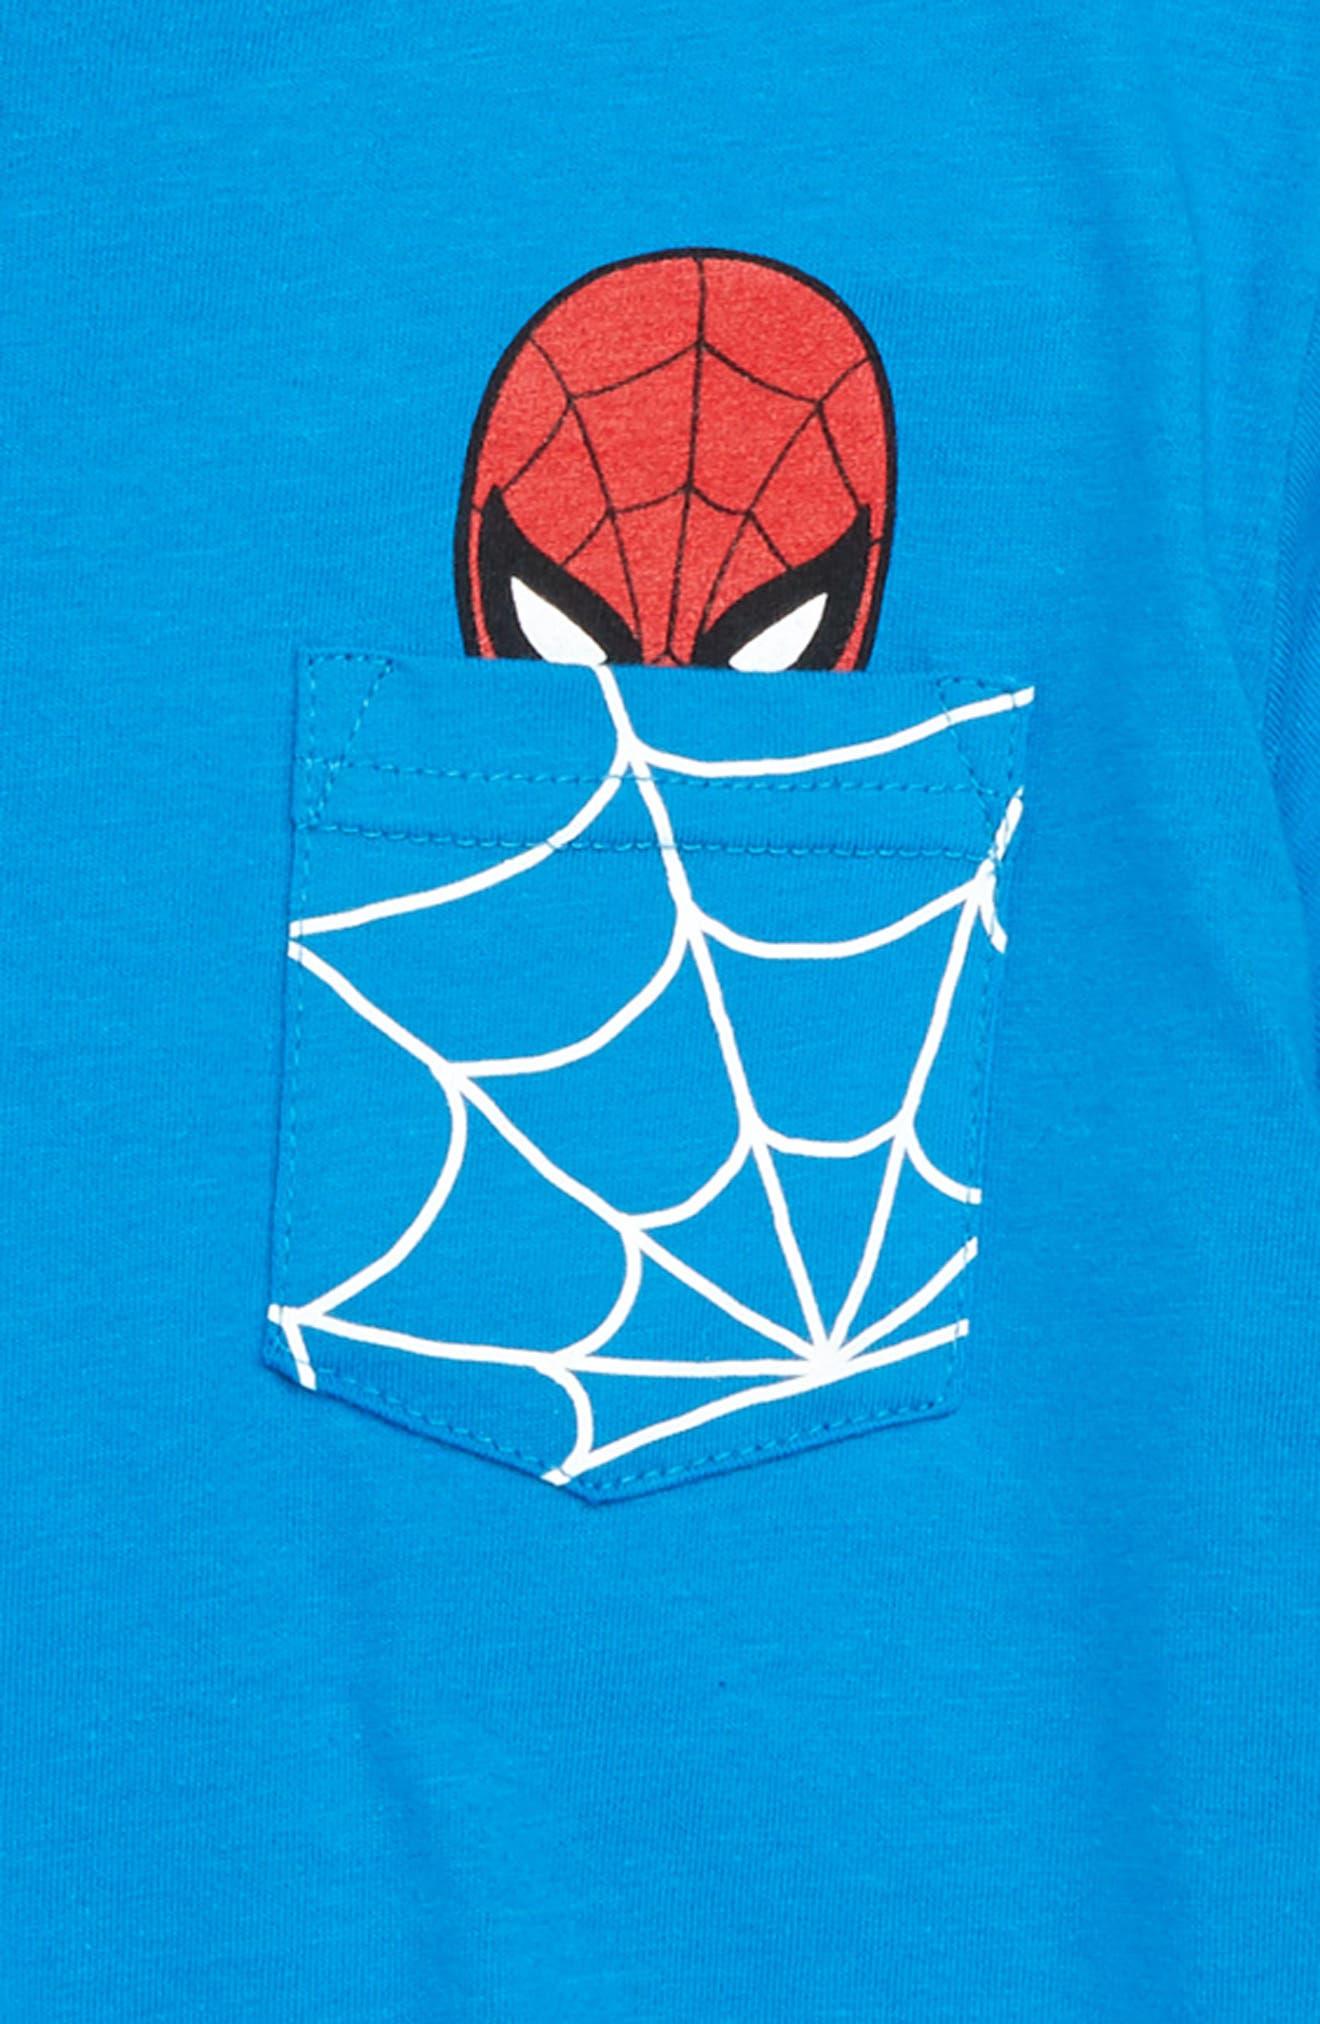 x Marvel<sup>®</sup> Avengers Spider-Man<sup>™</sup> Pocket T-Shirt,                             Alternate thumbnail 3, color,                             Blue